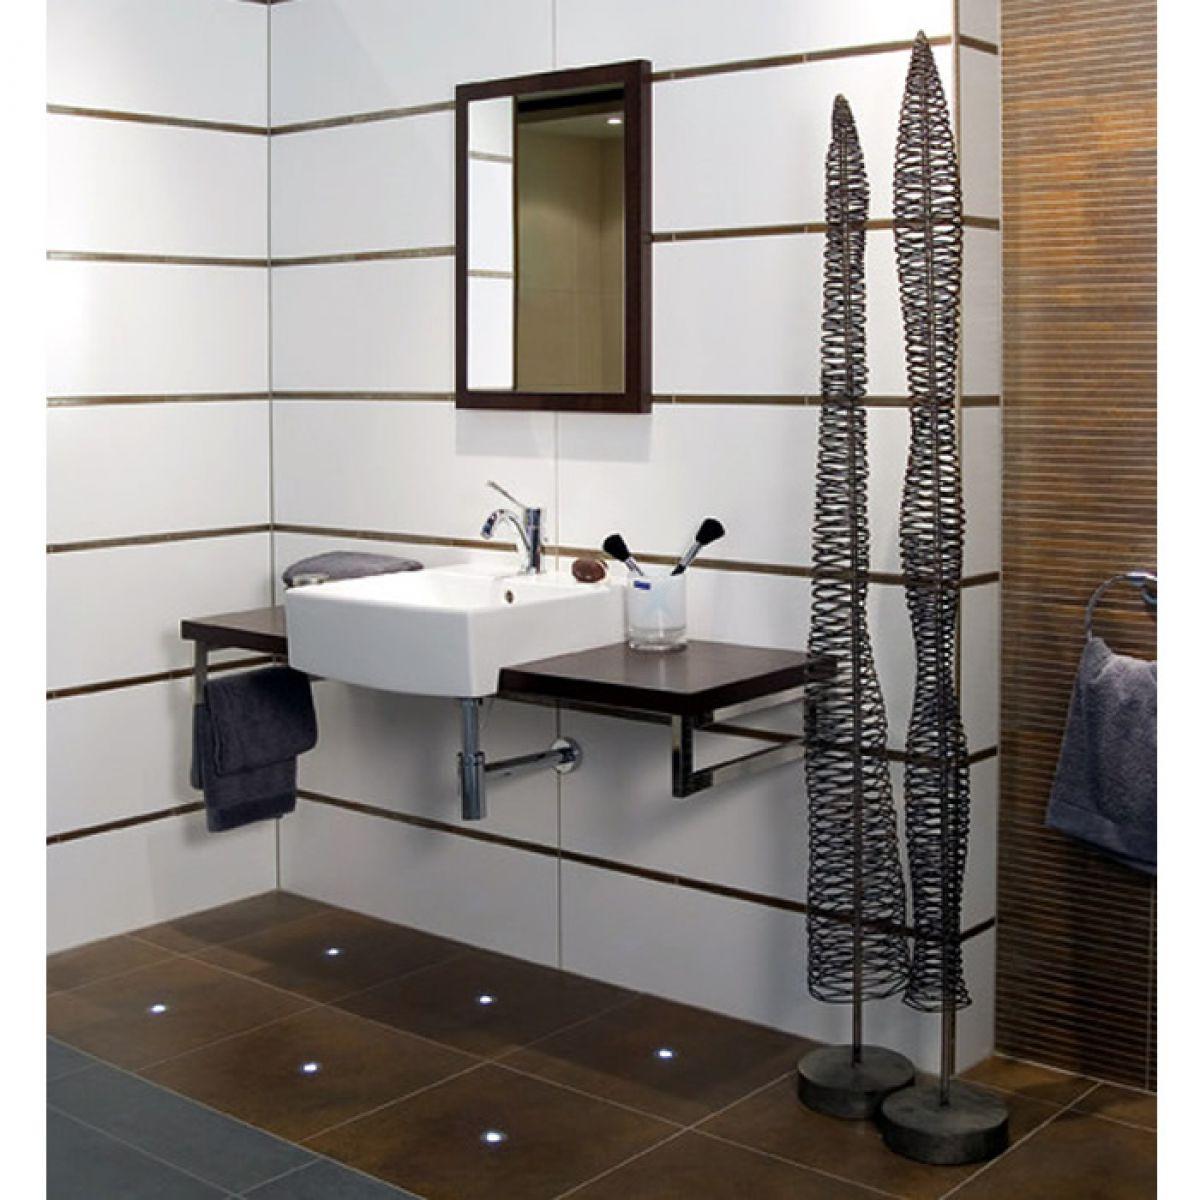 Bathroom Tiles Villeroy Boch villeroy & boch moonlight tile 1310 (30 x 90cm) : uk bathrooms